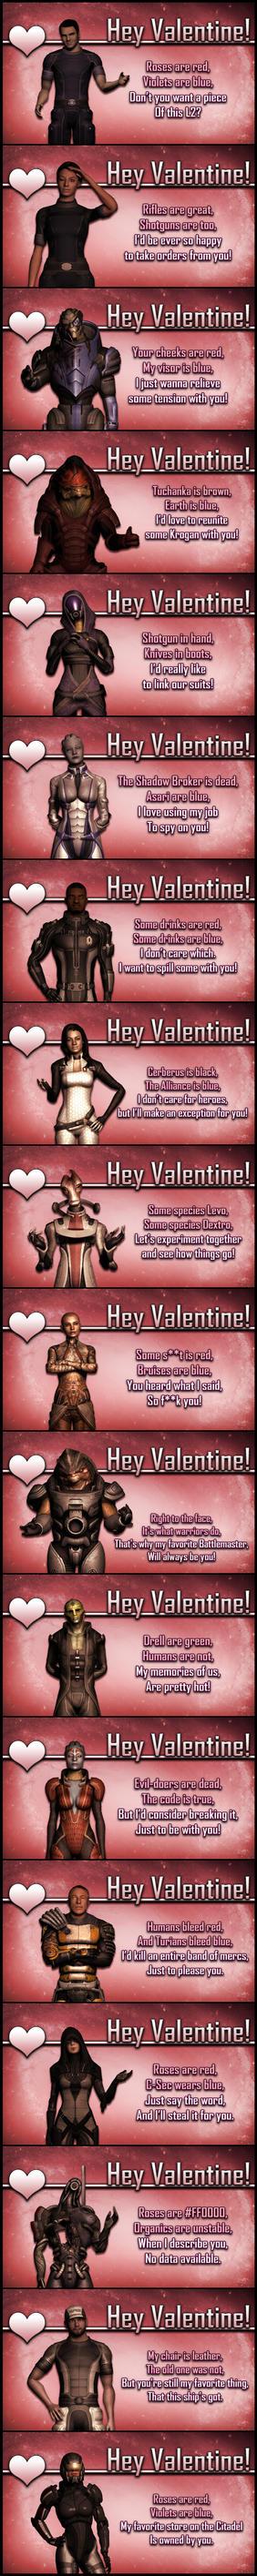 Hey Valentine by ImperatorAlicia